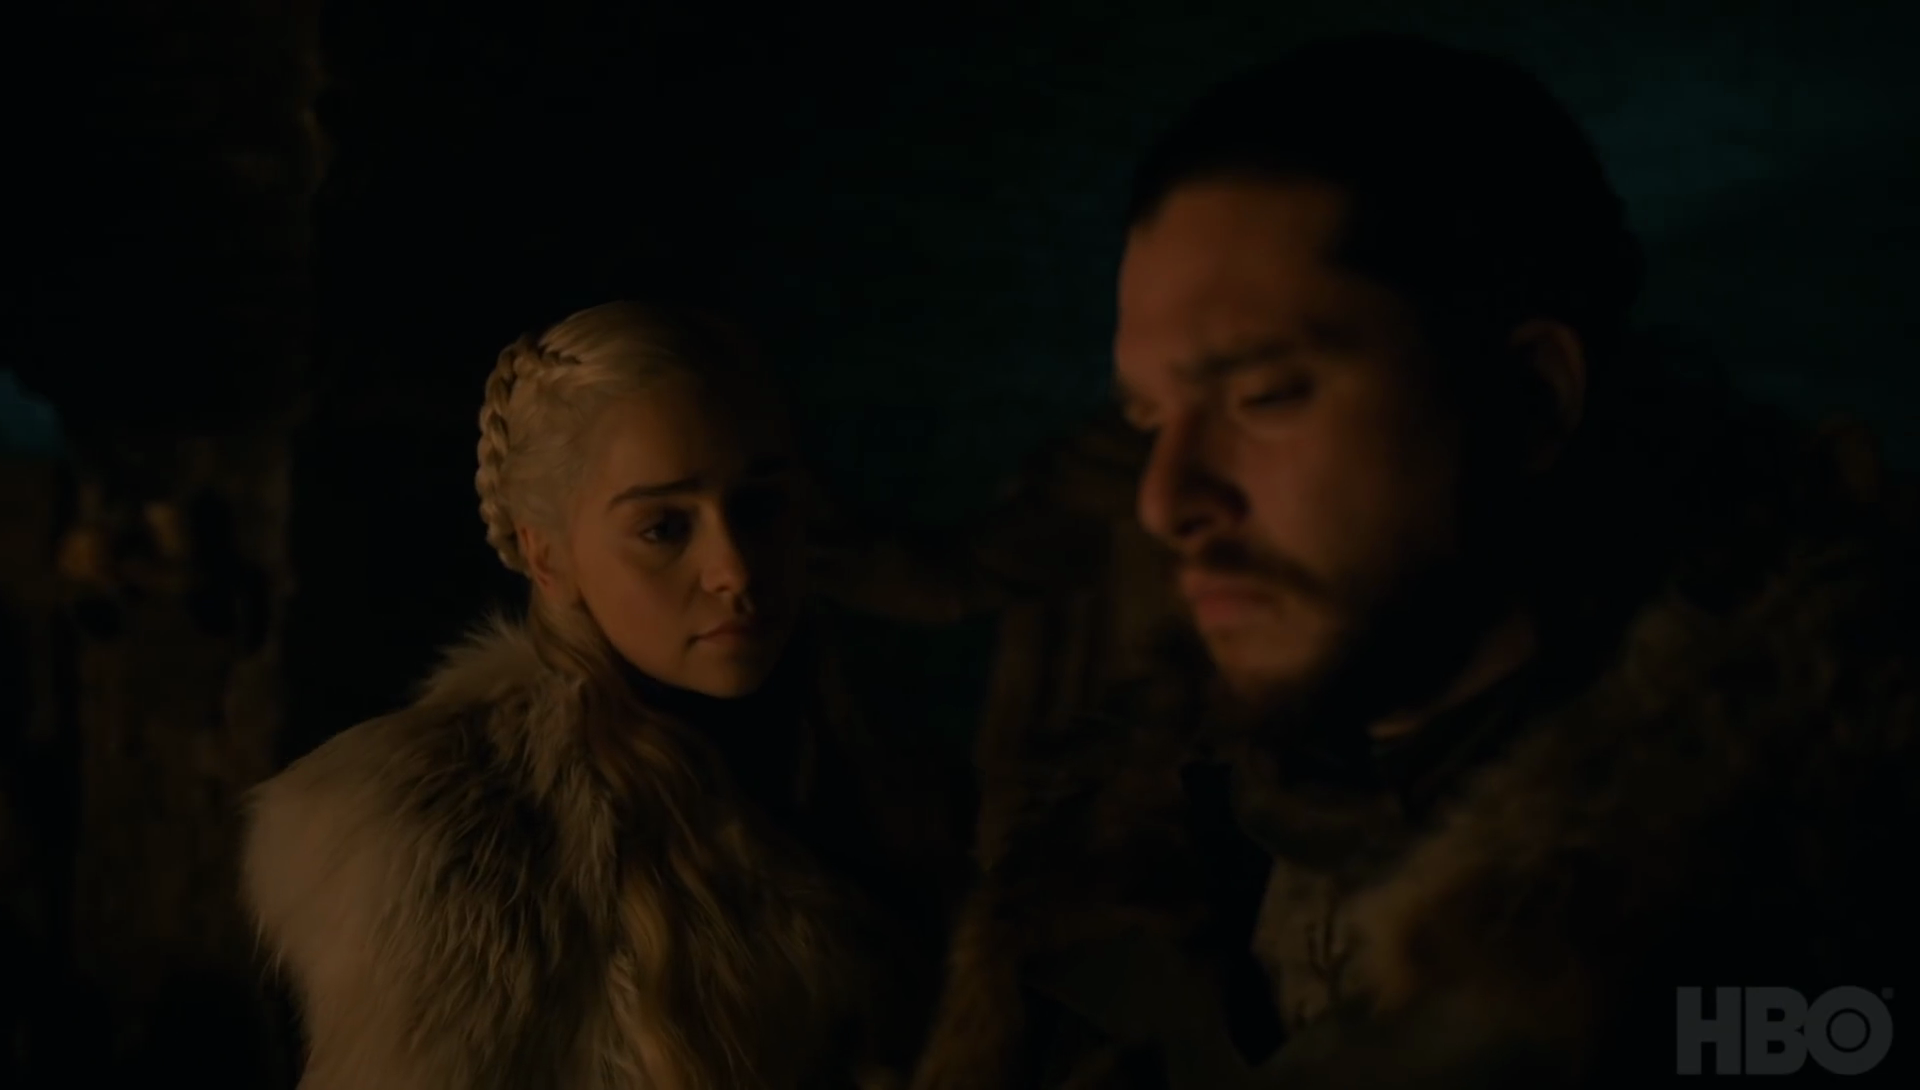 jon-snow-and-daenerys-targaryen